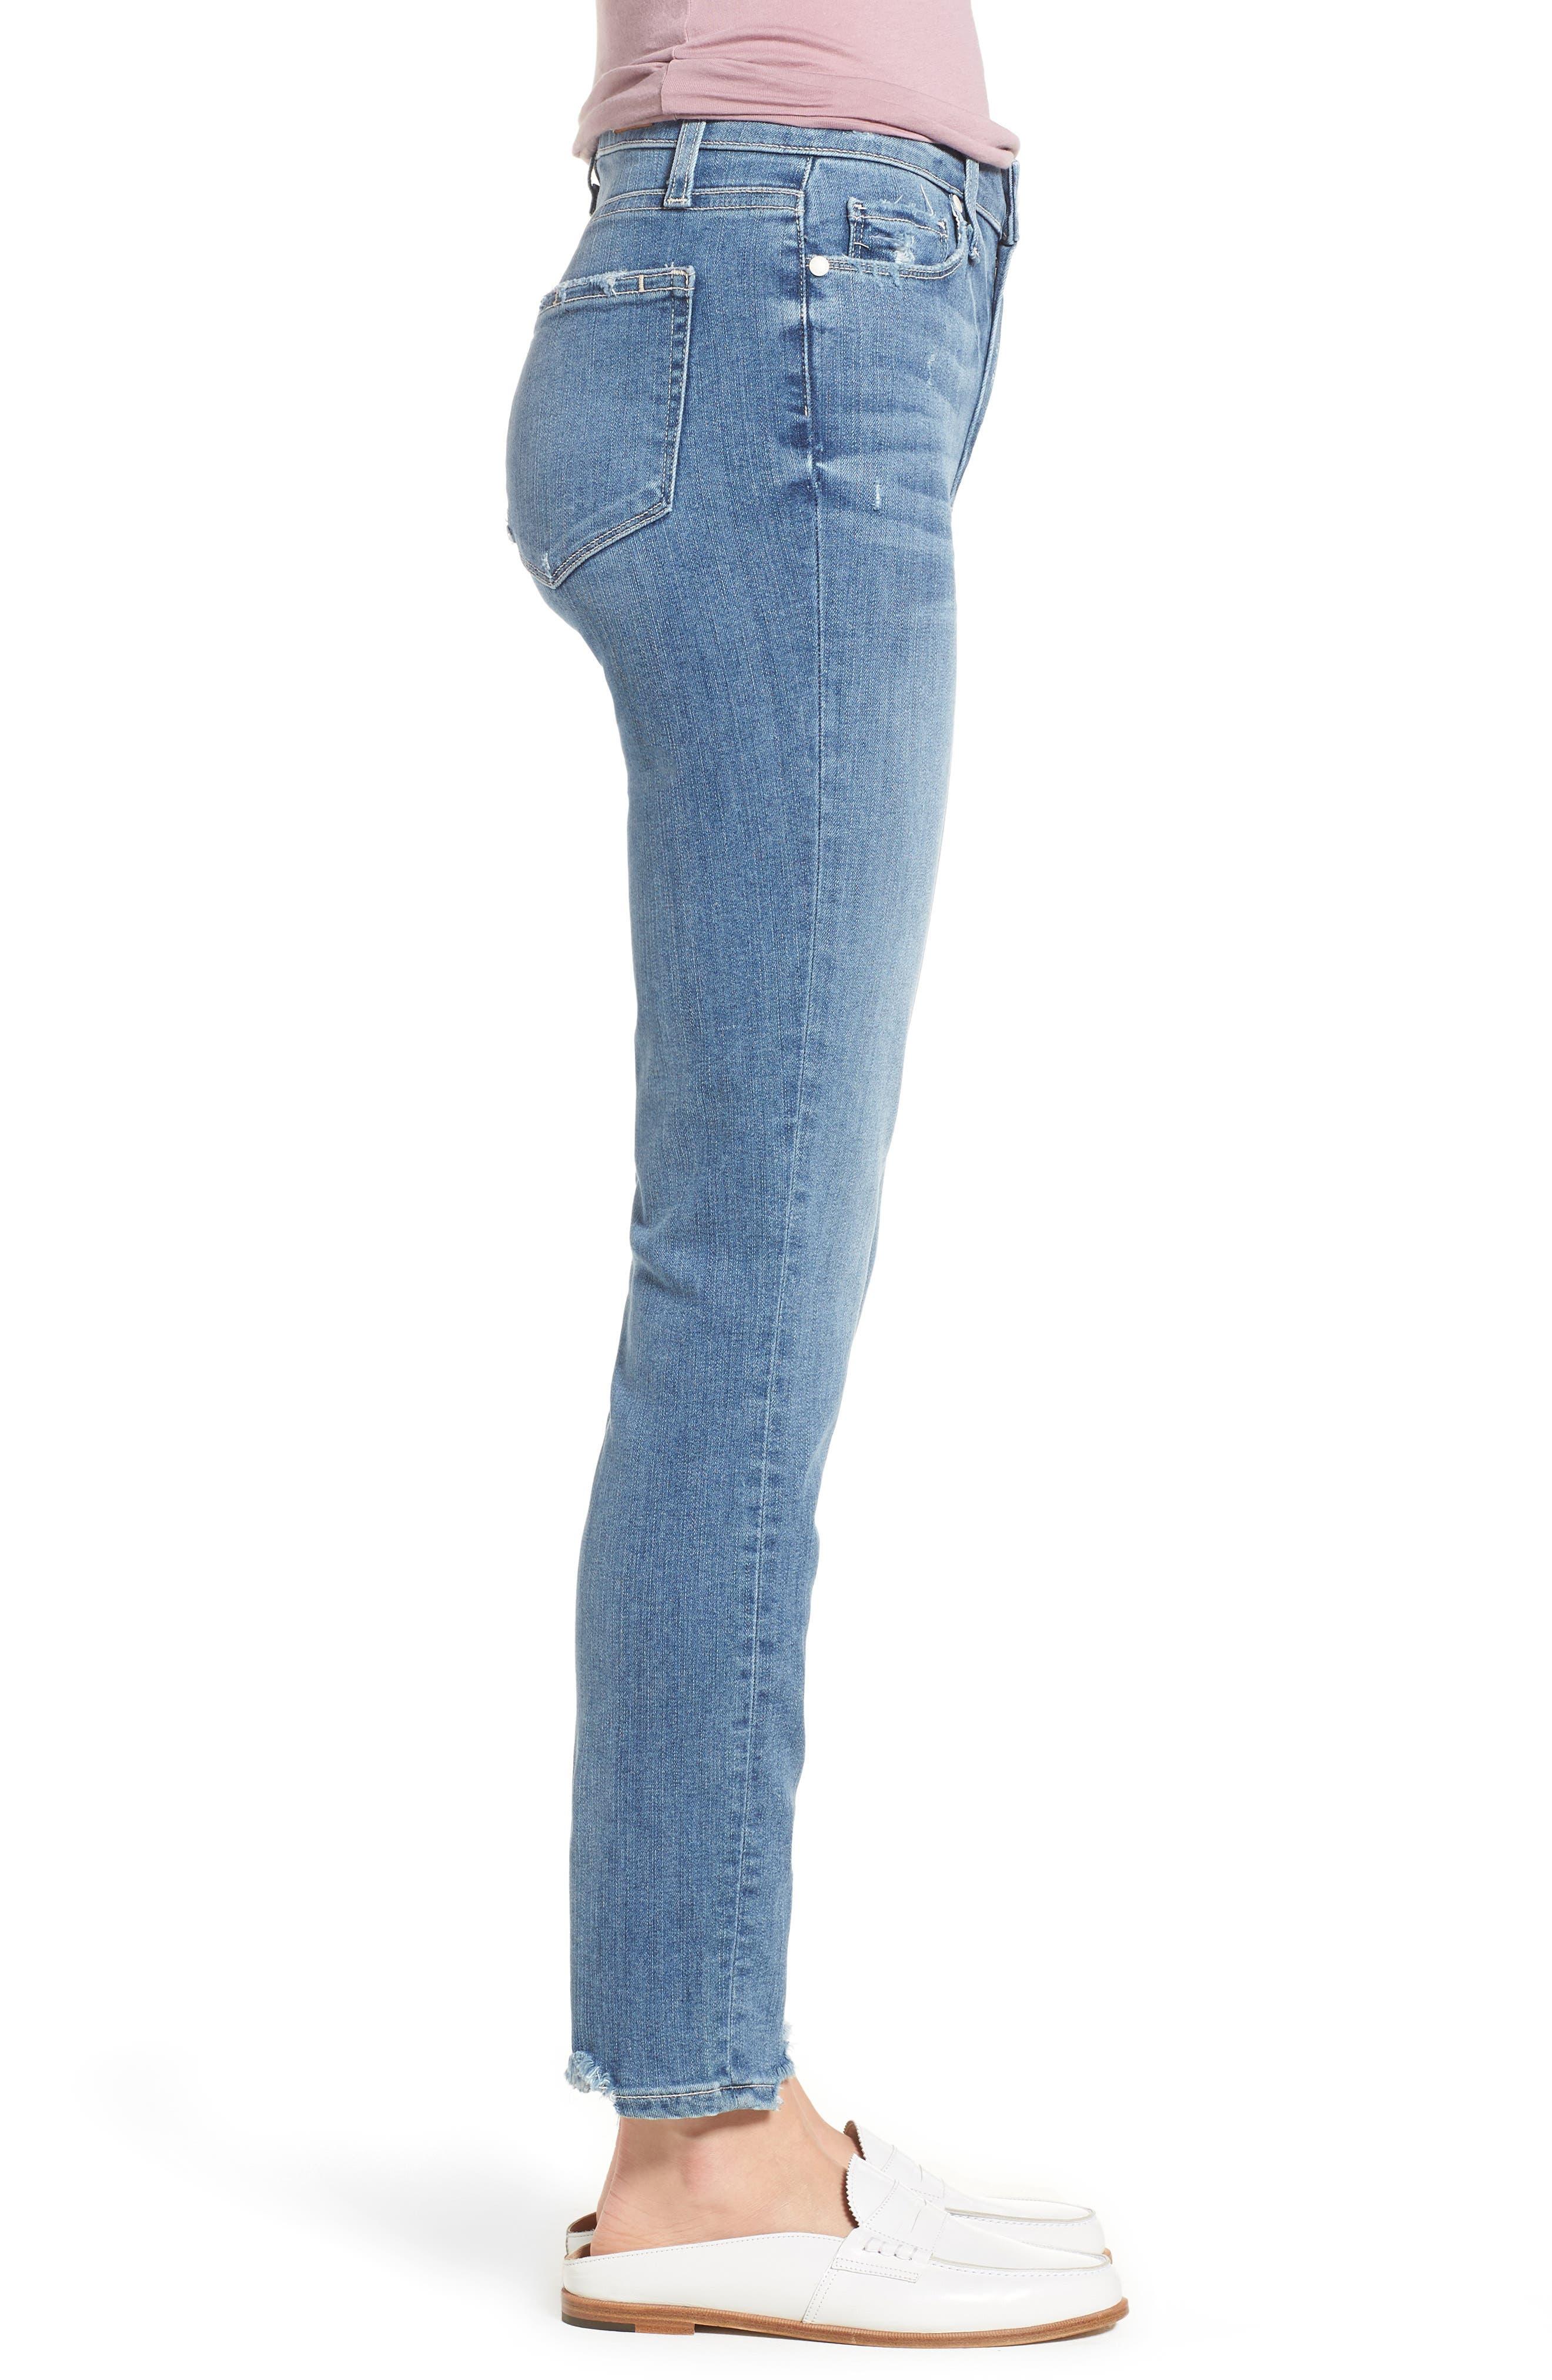 Transcend Vintage - Hoxton High Waist Ankle Skinny Jeans,                             Alternate thumbnail 3, color,                             ZAHARA